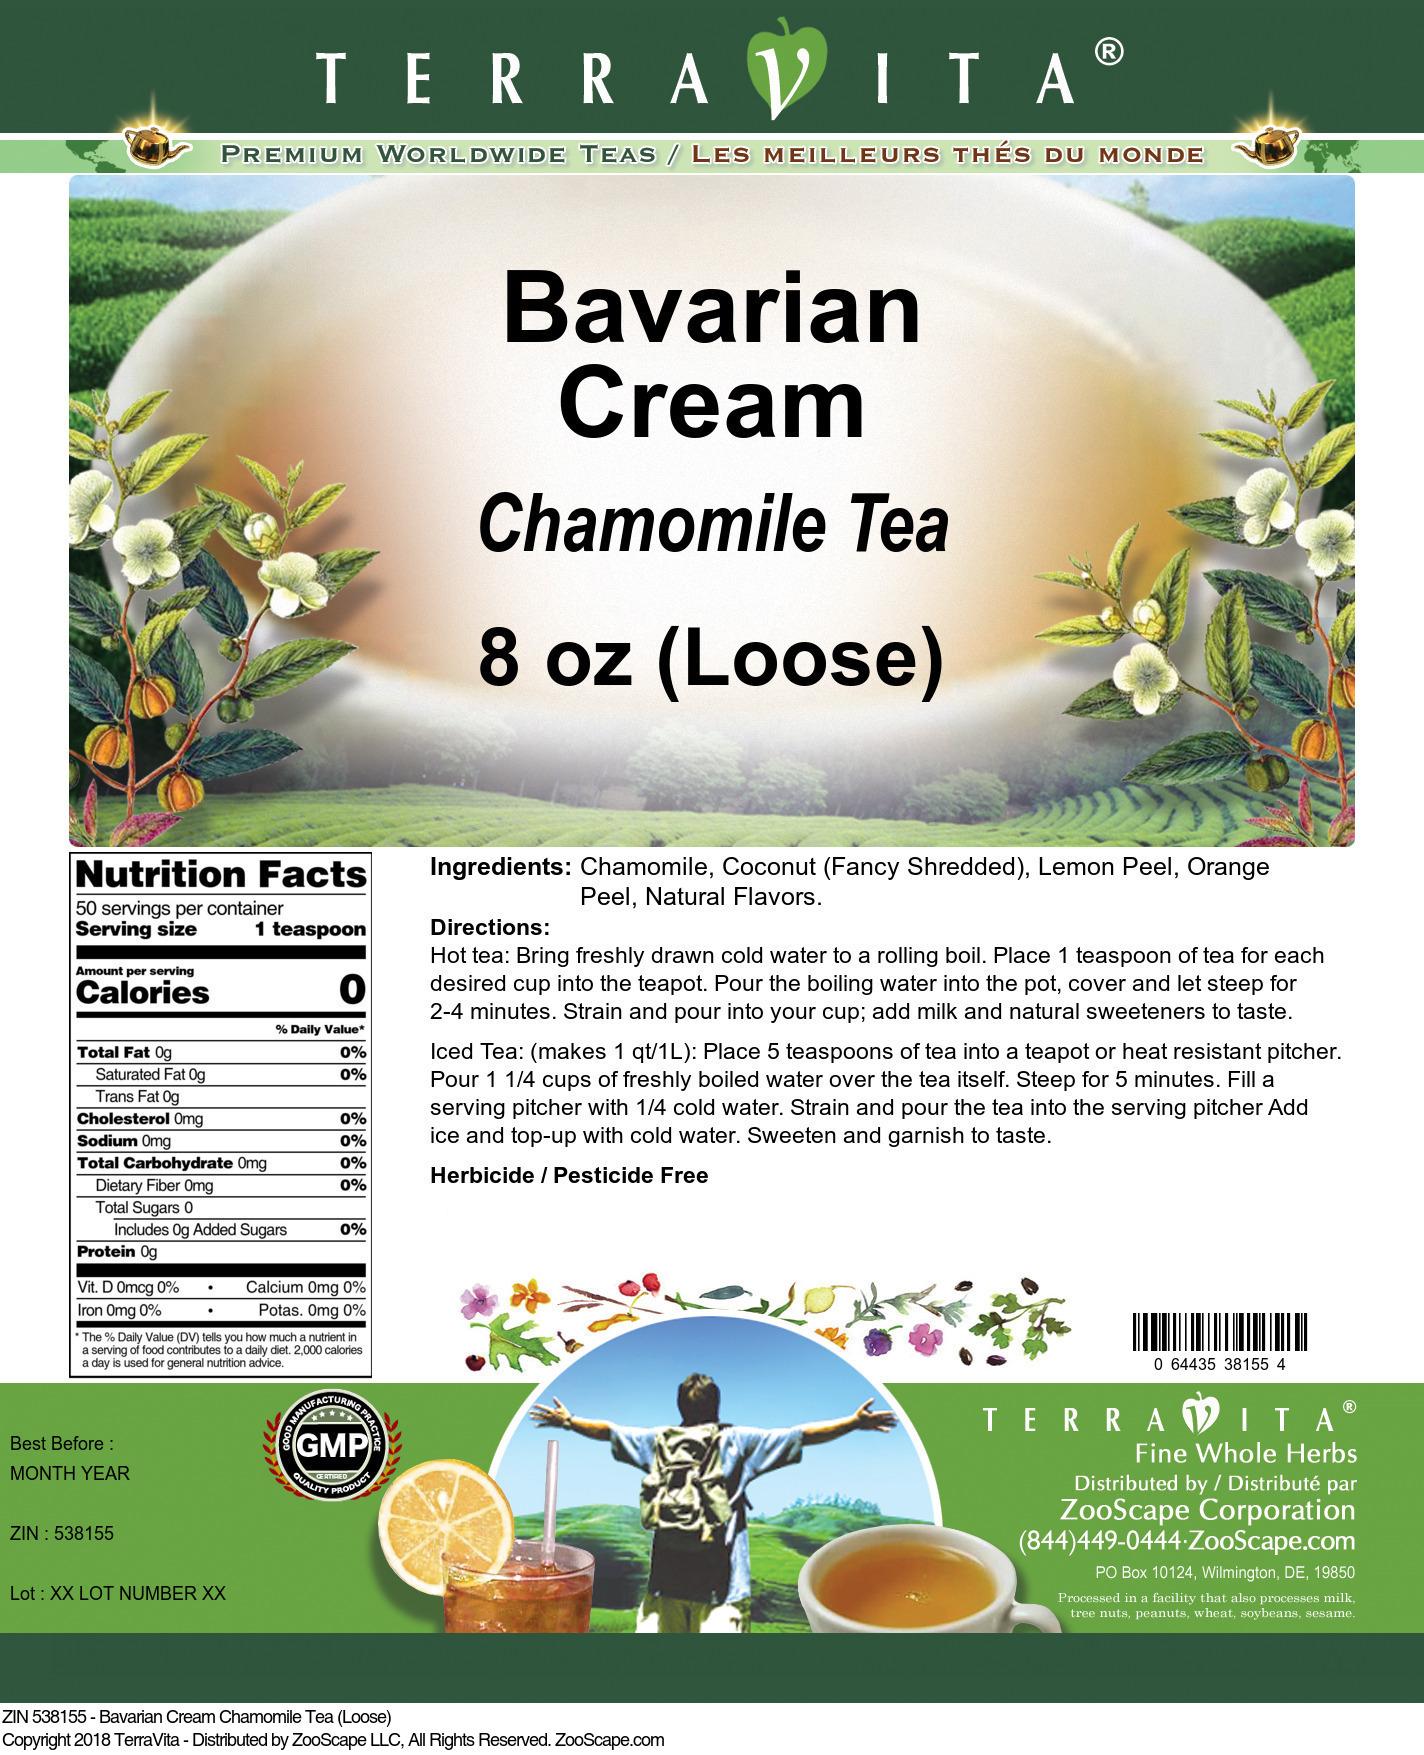 Bavarian Cream Chamomile Tea